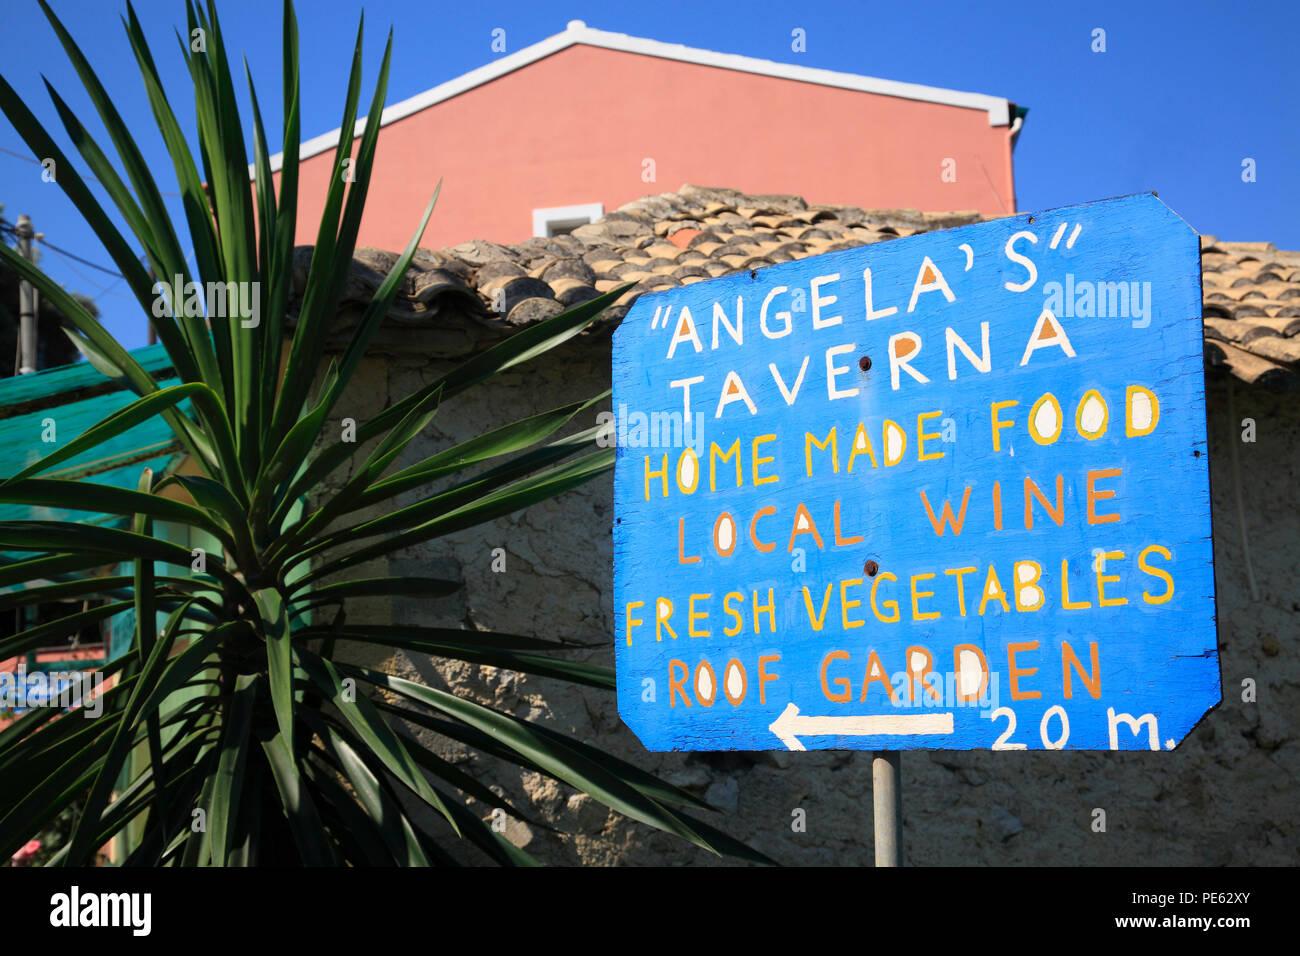 Pentati, Angelas Tavern, Corfu, Greece, Europe - Stock Image